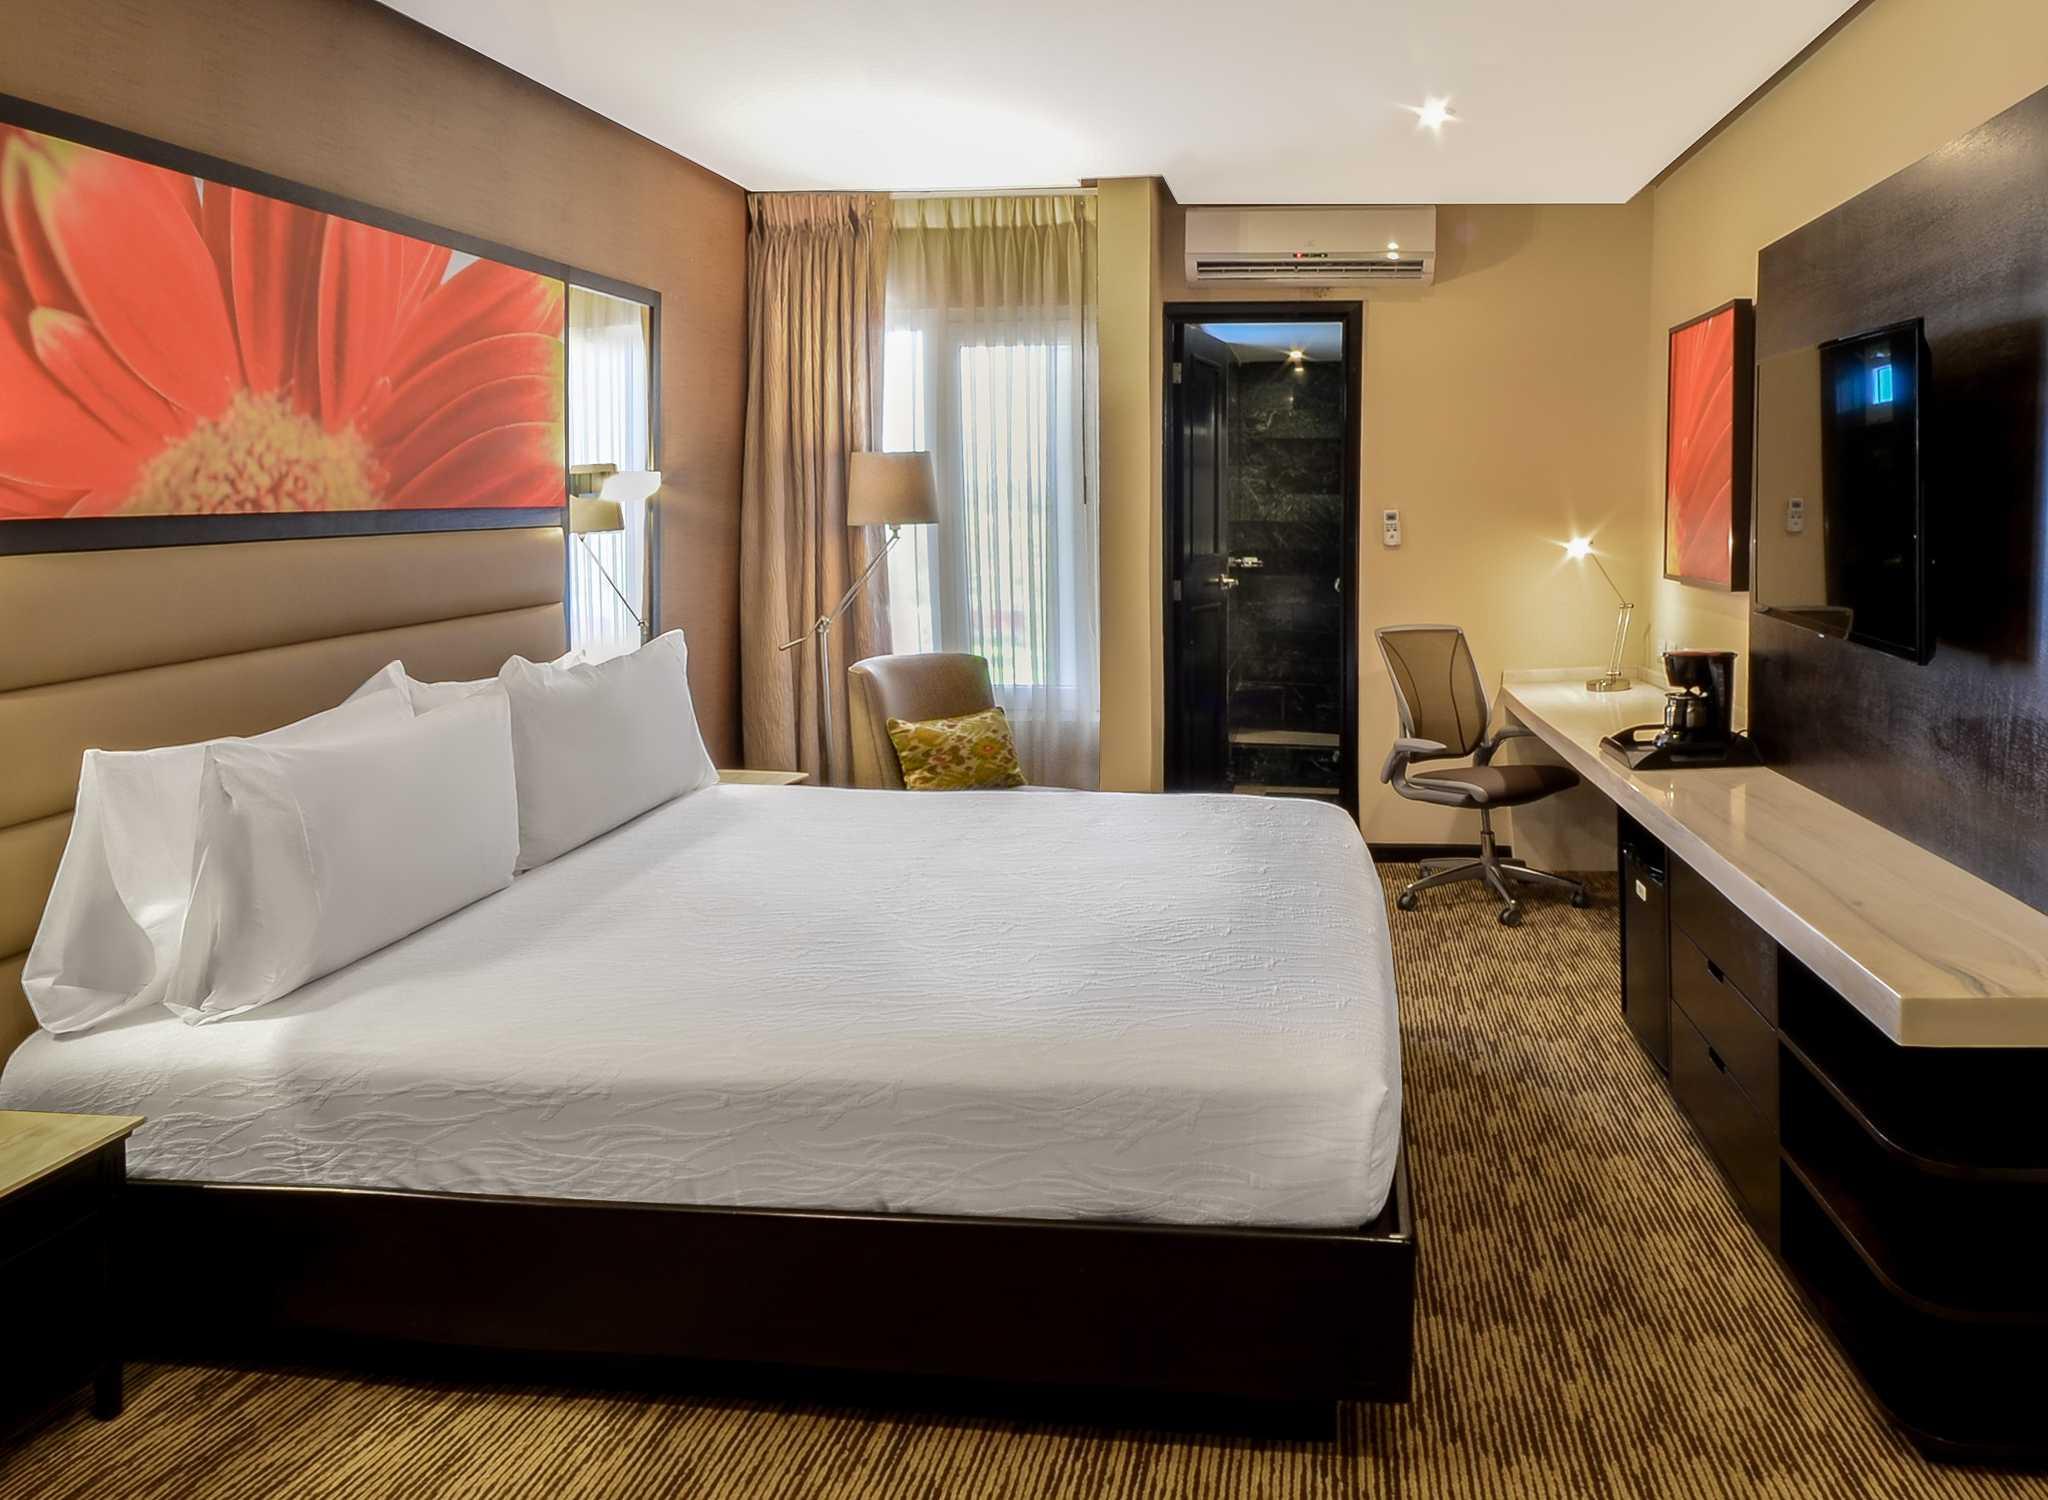 Hotel Hilton Garden Inn Cuidad de Guatemala Hotels en Guatemala